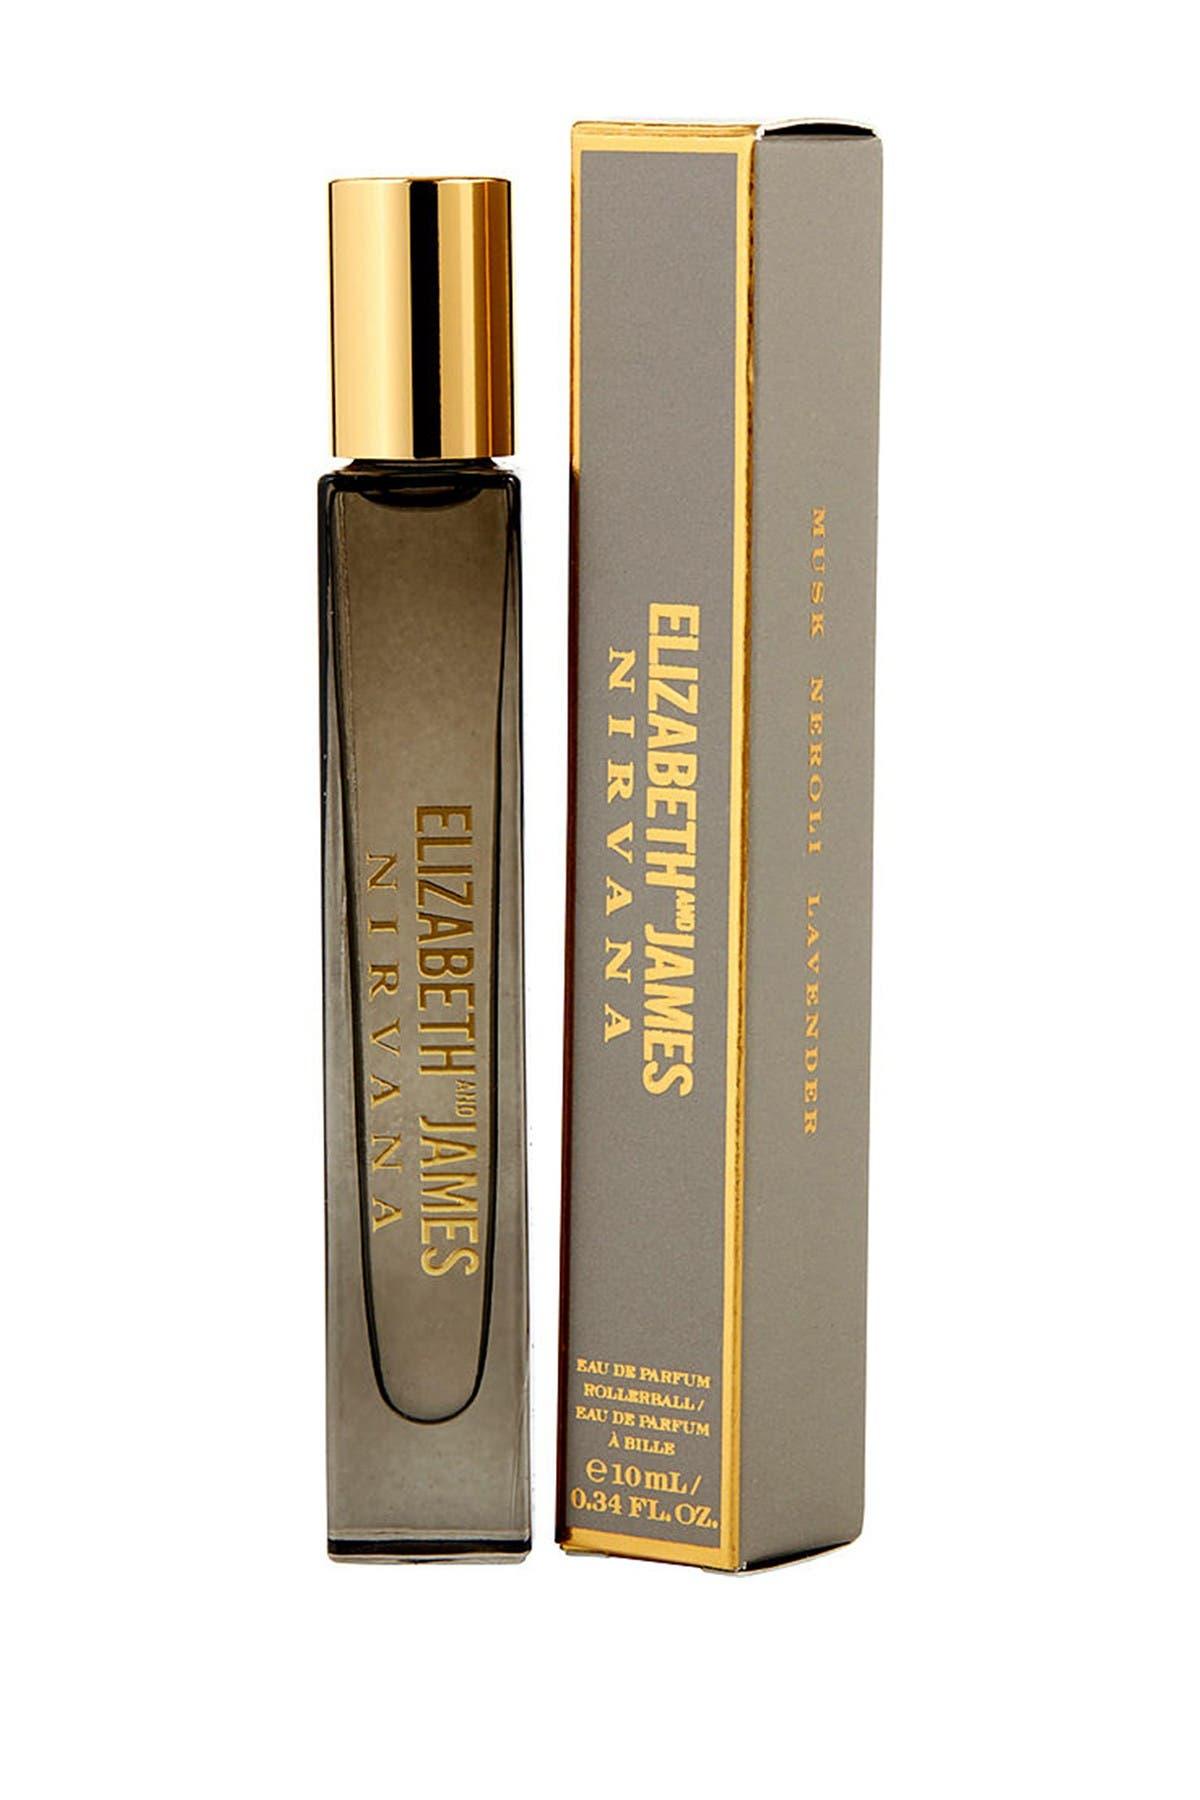 Image of Elizabeth and James Elizabeth & James Nirvana French Grey Eau de Parfum Rollerball - 0.34 fl. oz.